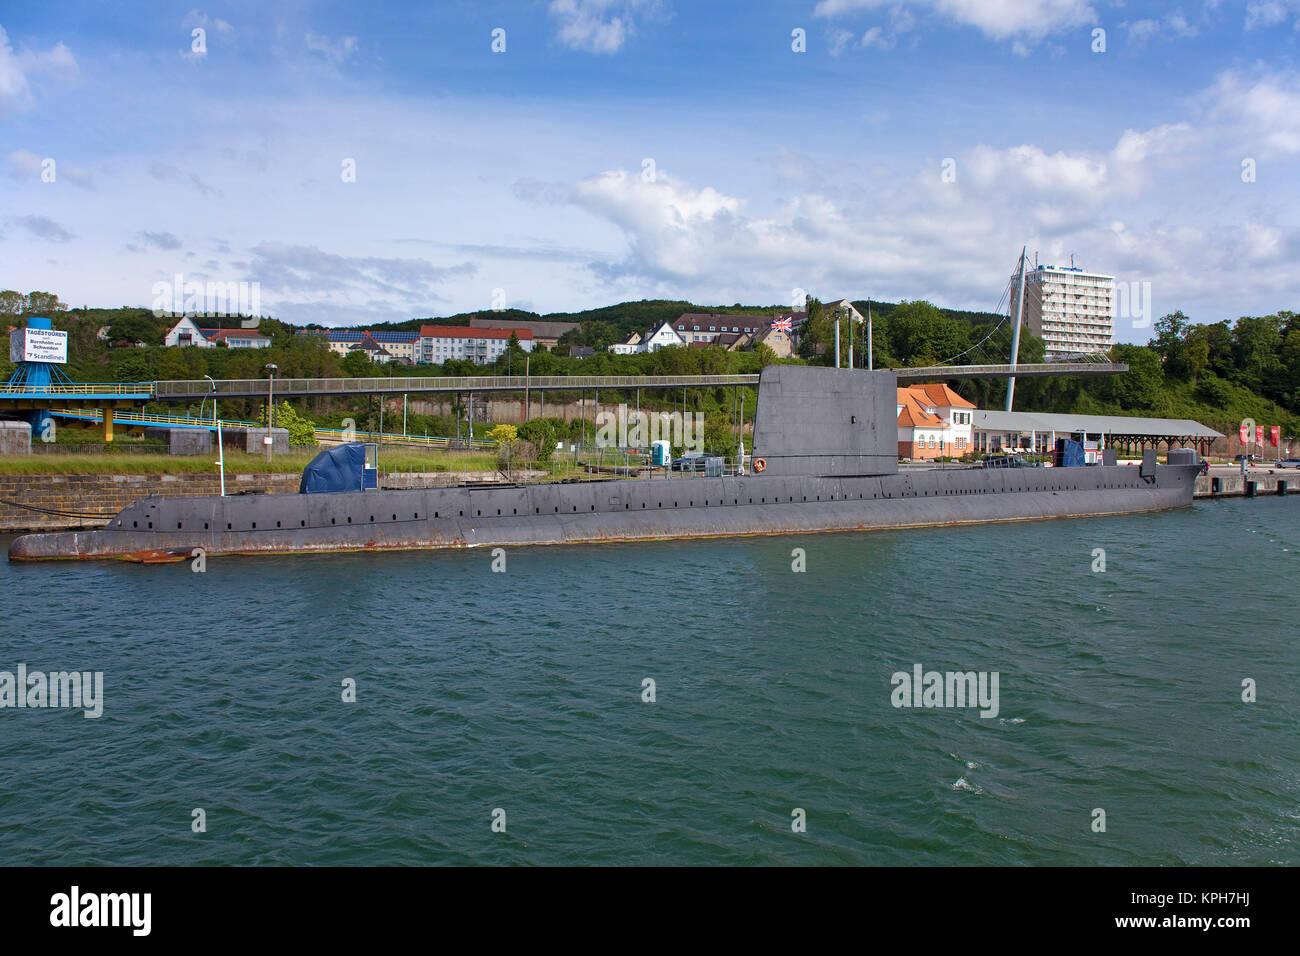 British submarin HMS Otus at harbour, used as museum, behind hotel Ruegen and pedestrian bridge, Sassnitz, Ruegen - Stock Image